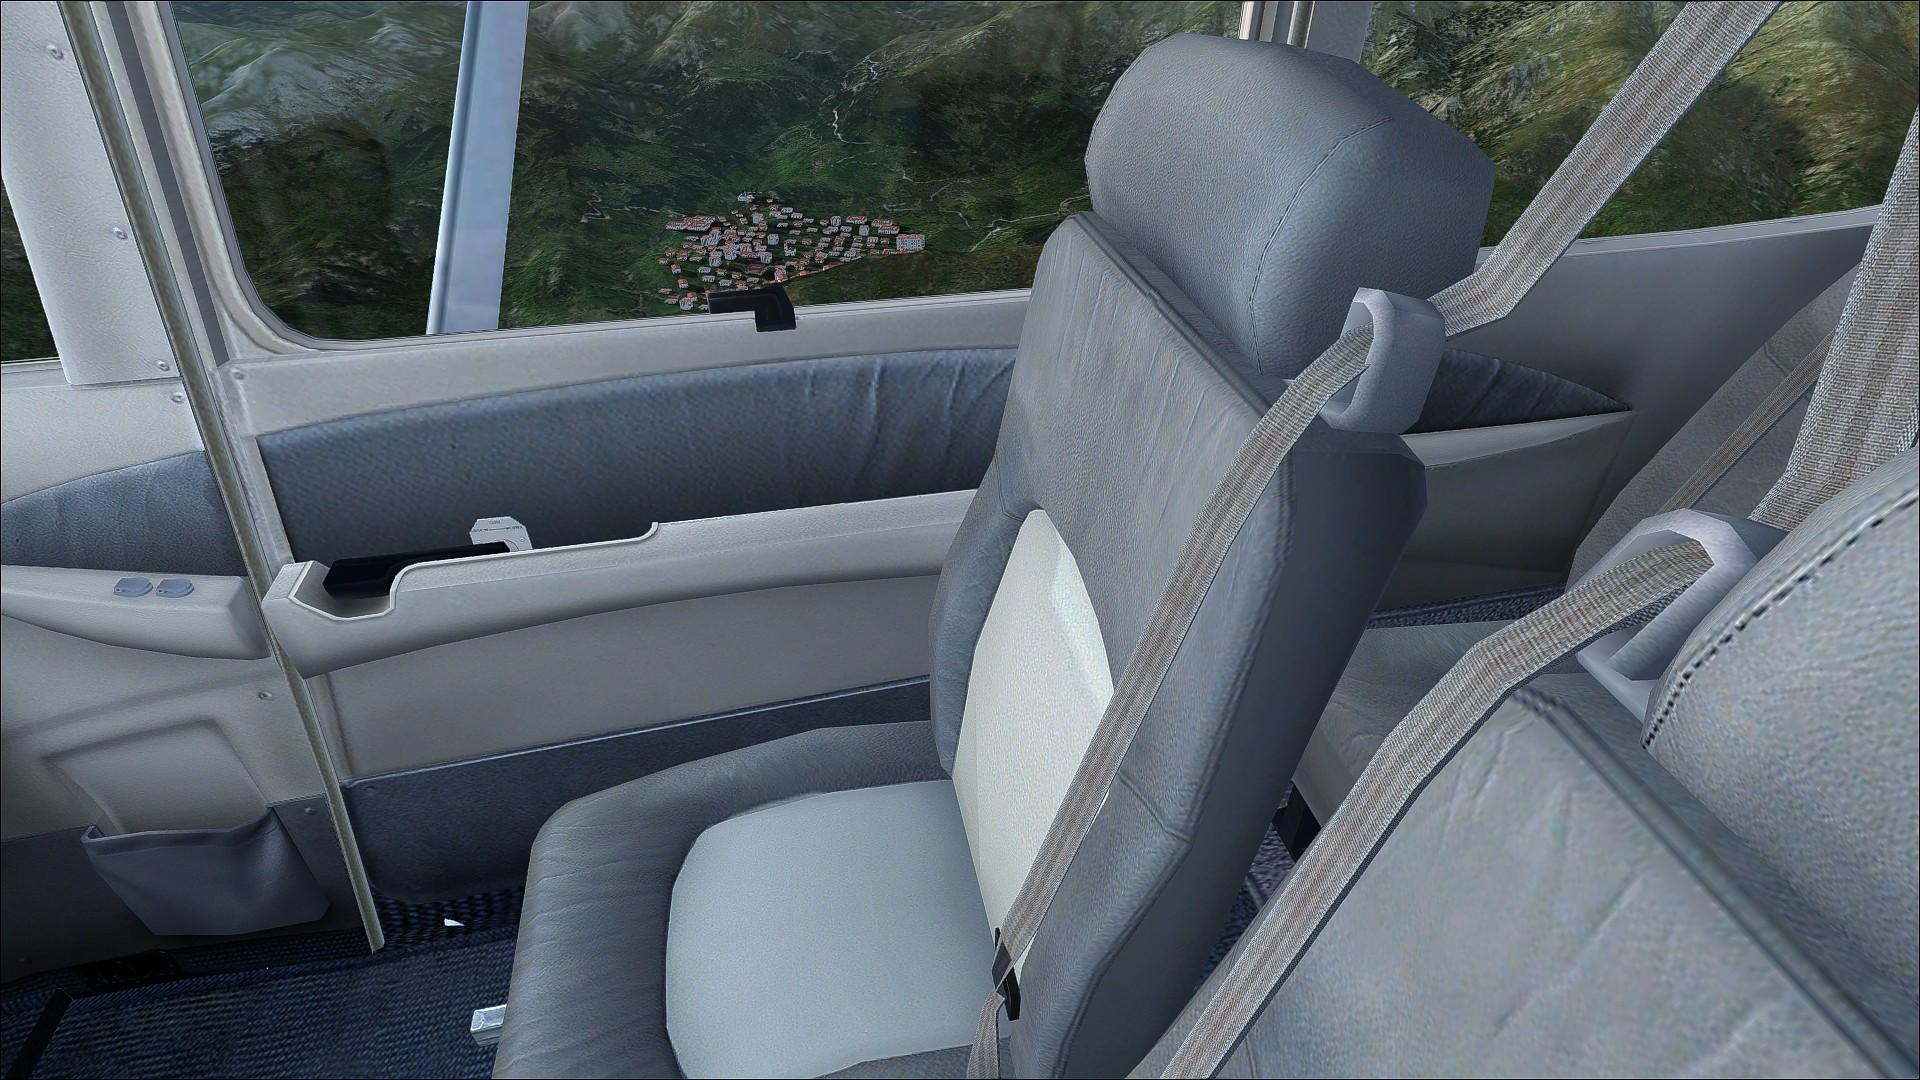 Crash en Corse 242397805